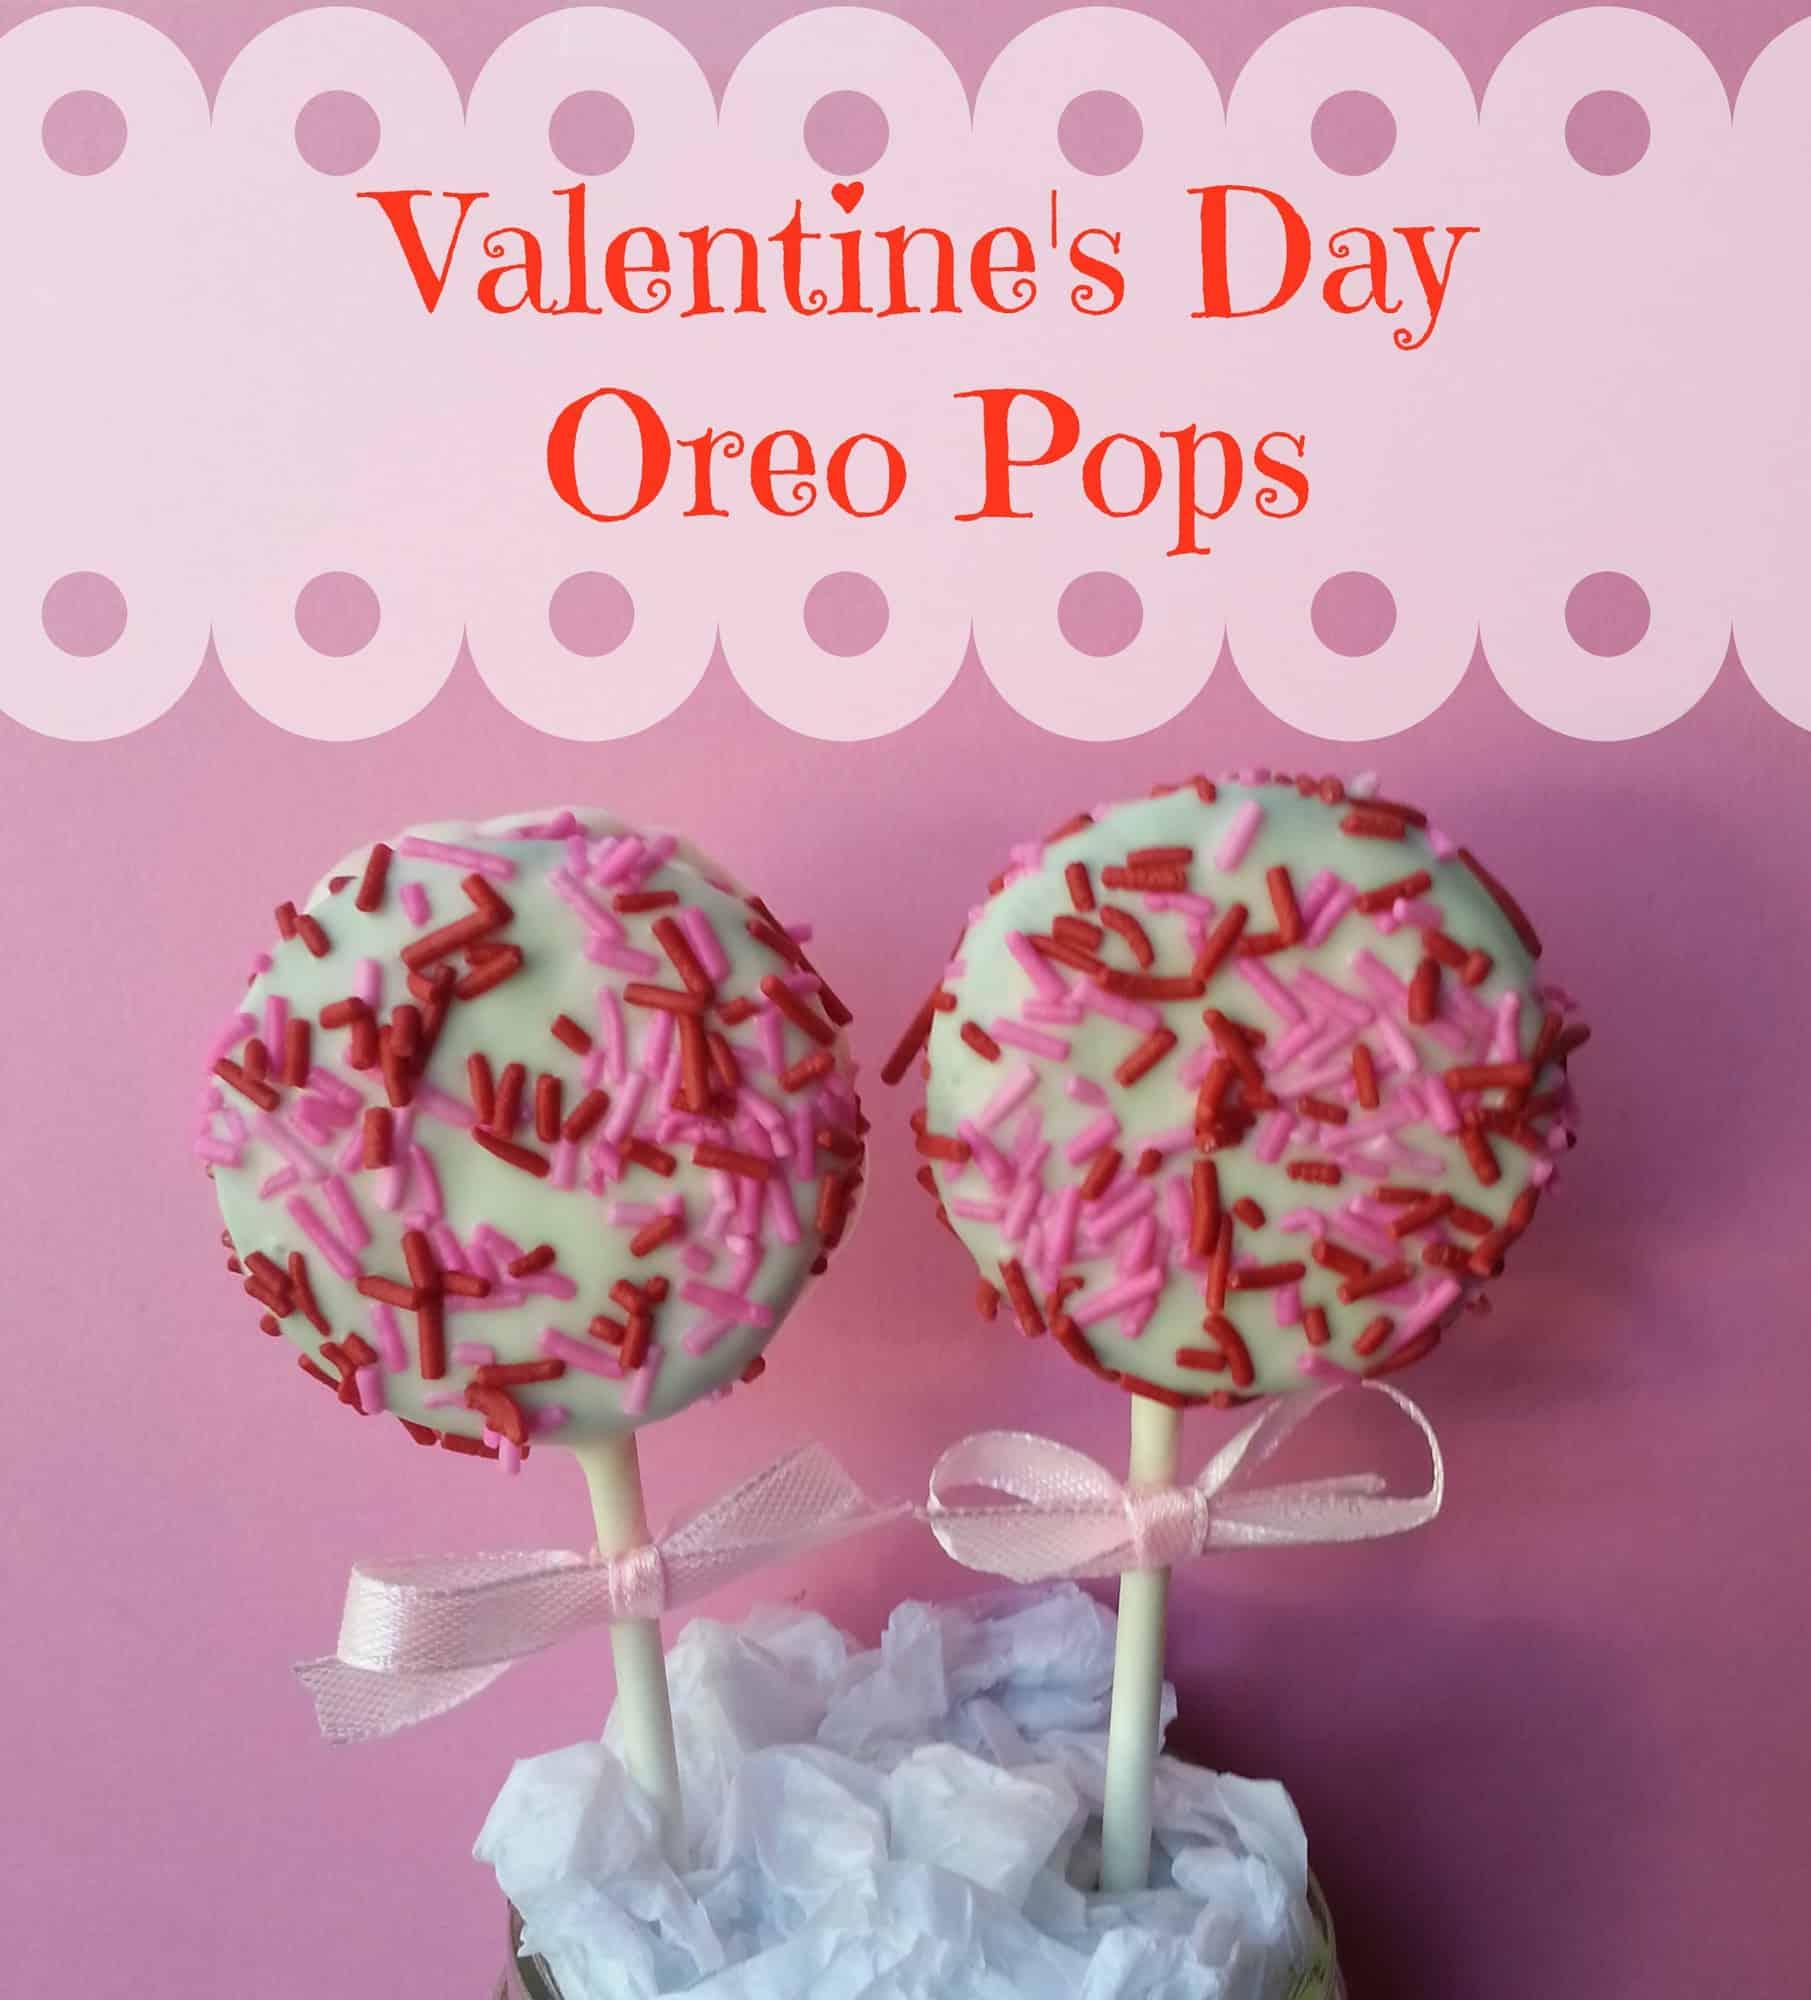 Valentine's Day Party Dessert Idea – Valentines Day Oreo Pops Recipe via LittleMissKate.ca